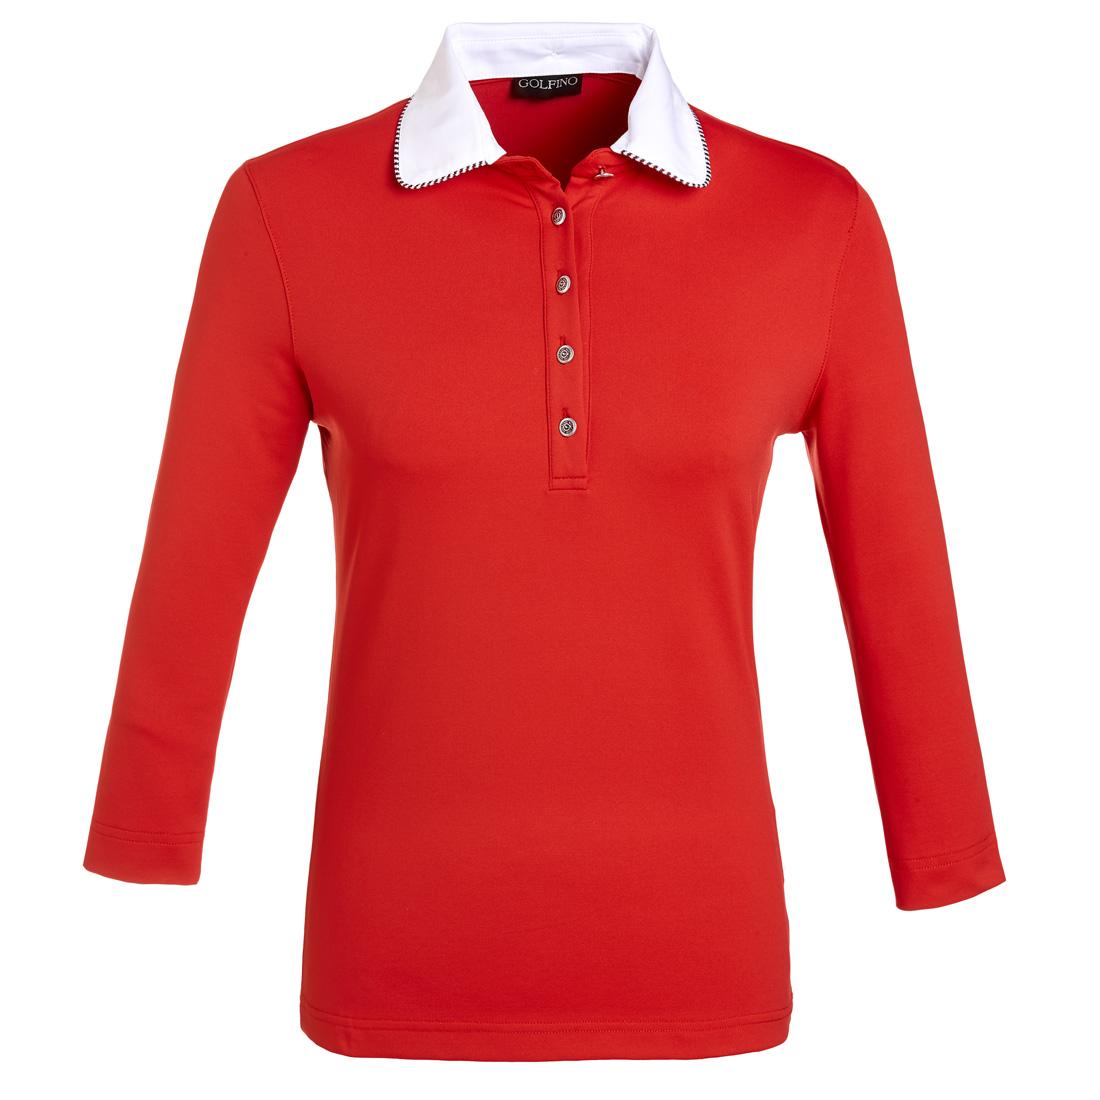 Dry Comfort Poloshirt mit 3/4 Arm Rot